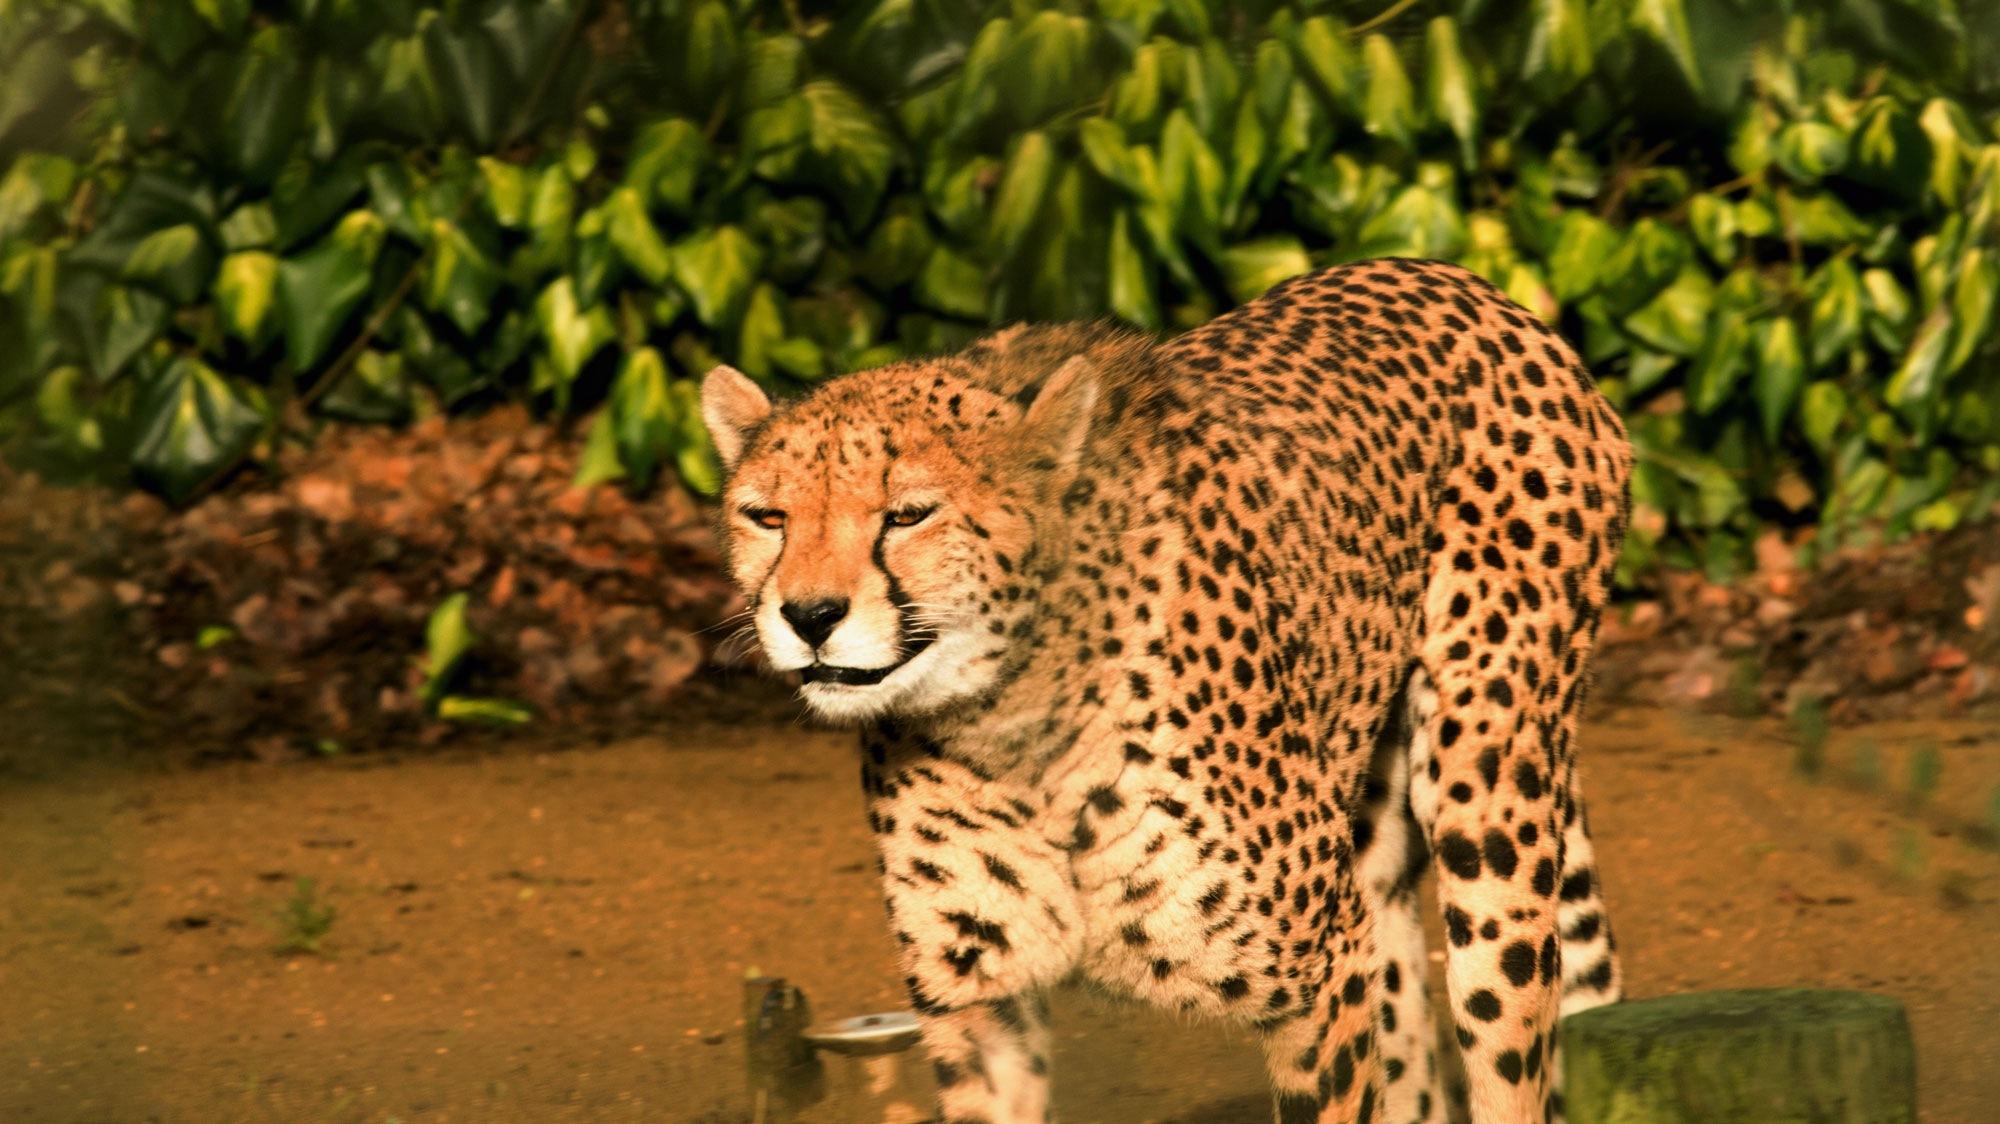 Cheetah by Karen